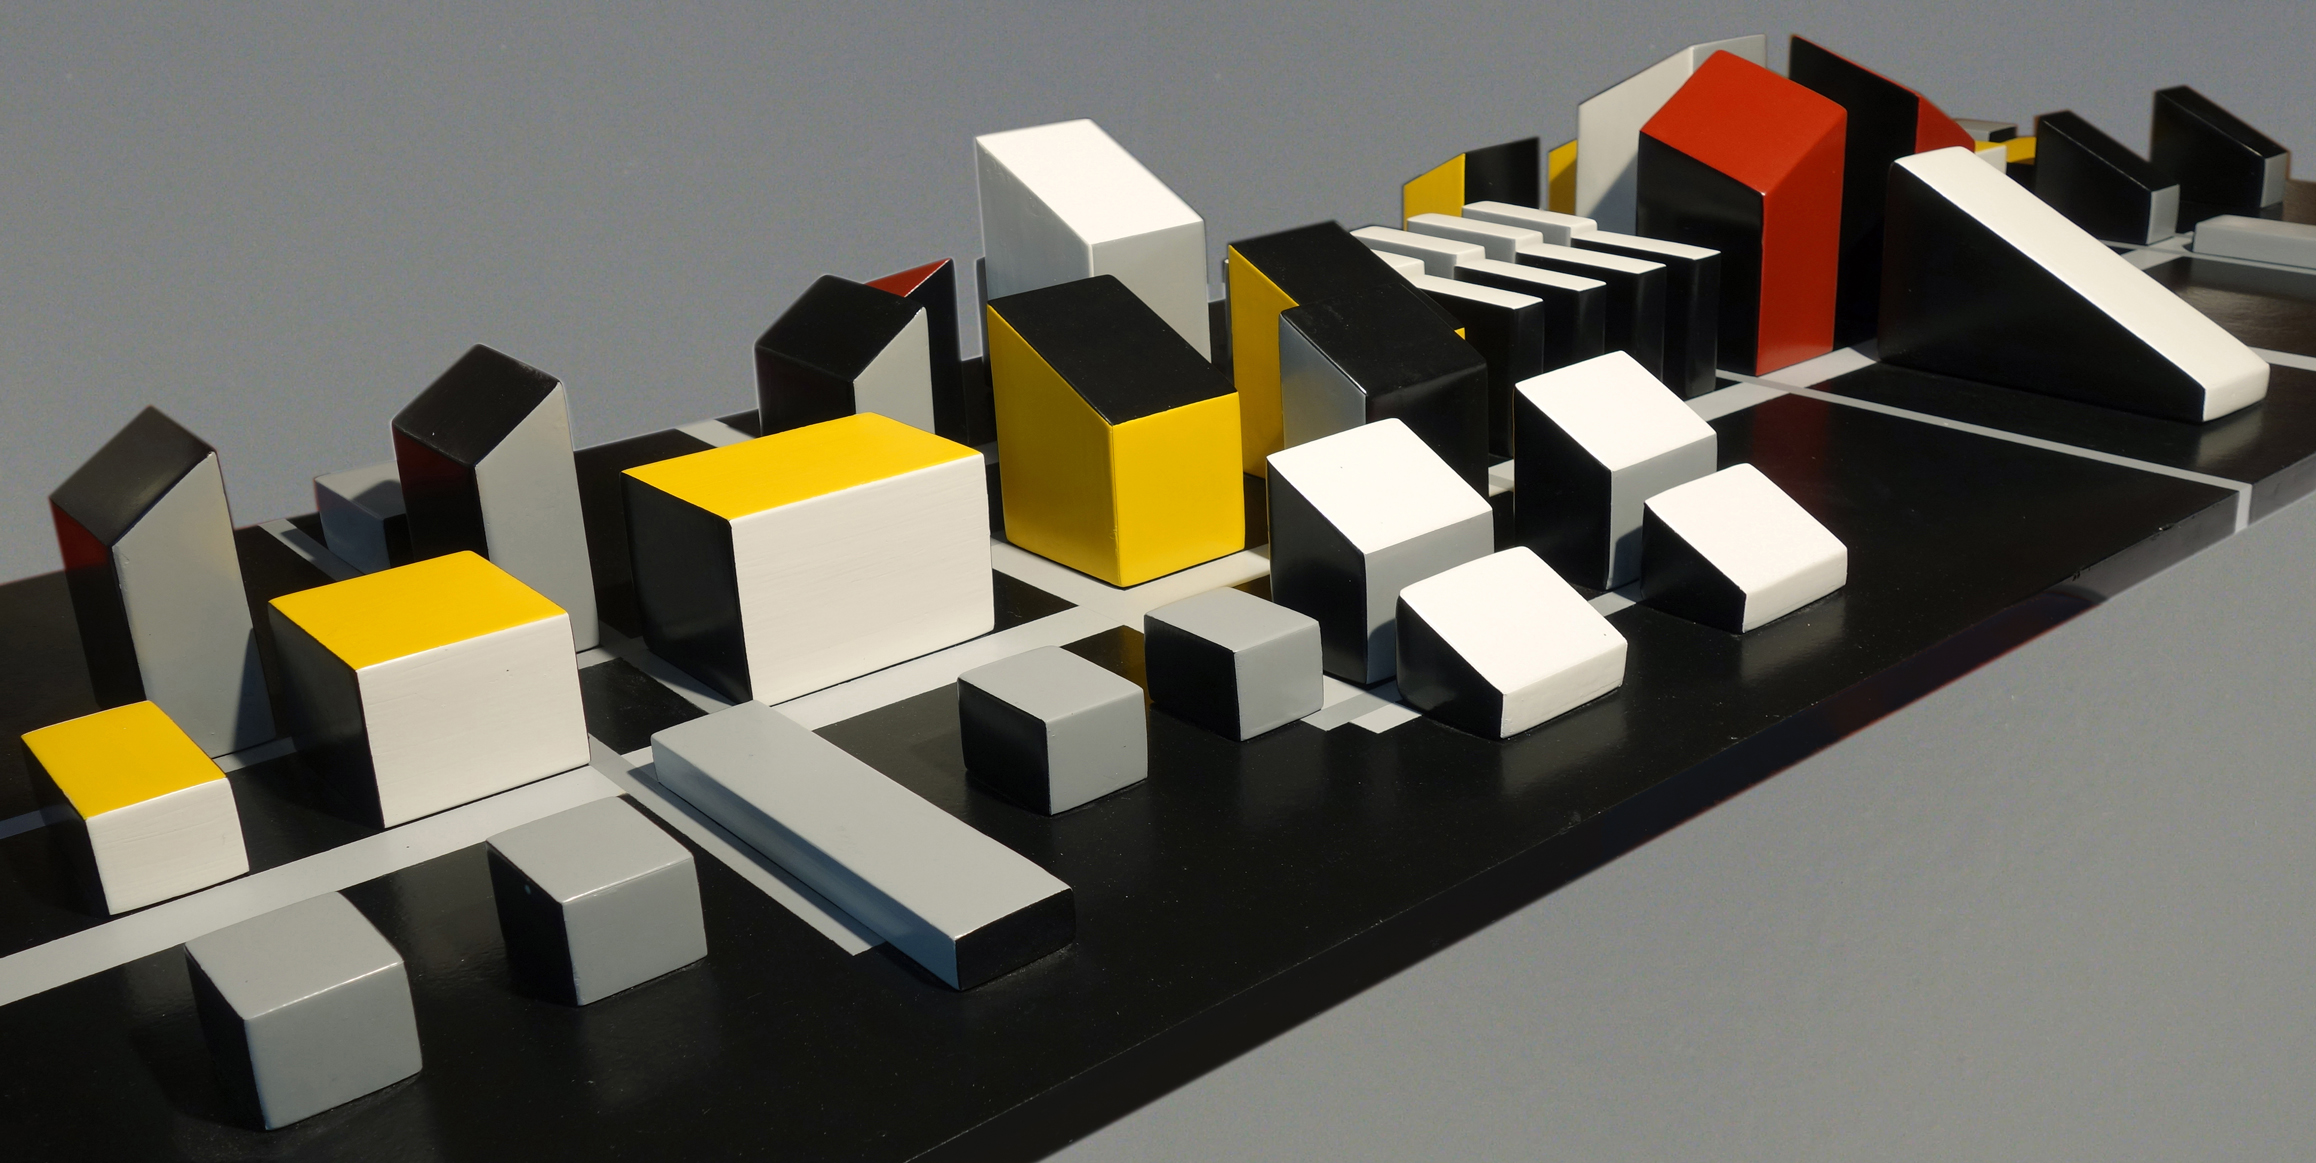 koenig_ulf_manhattanv-a-postmodern-upgrading